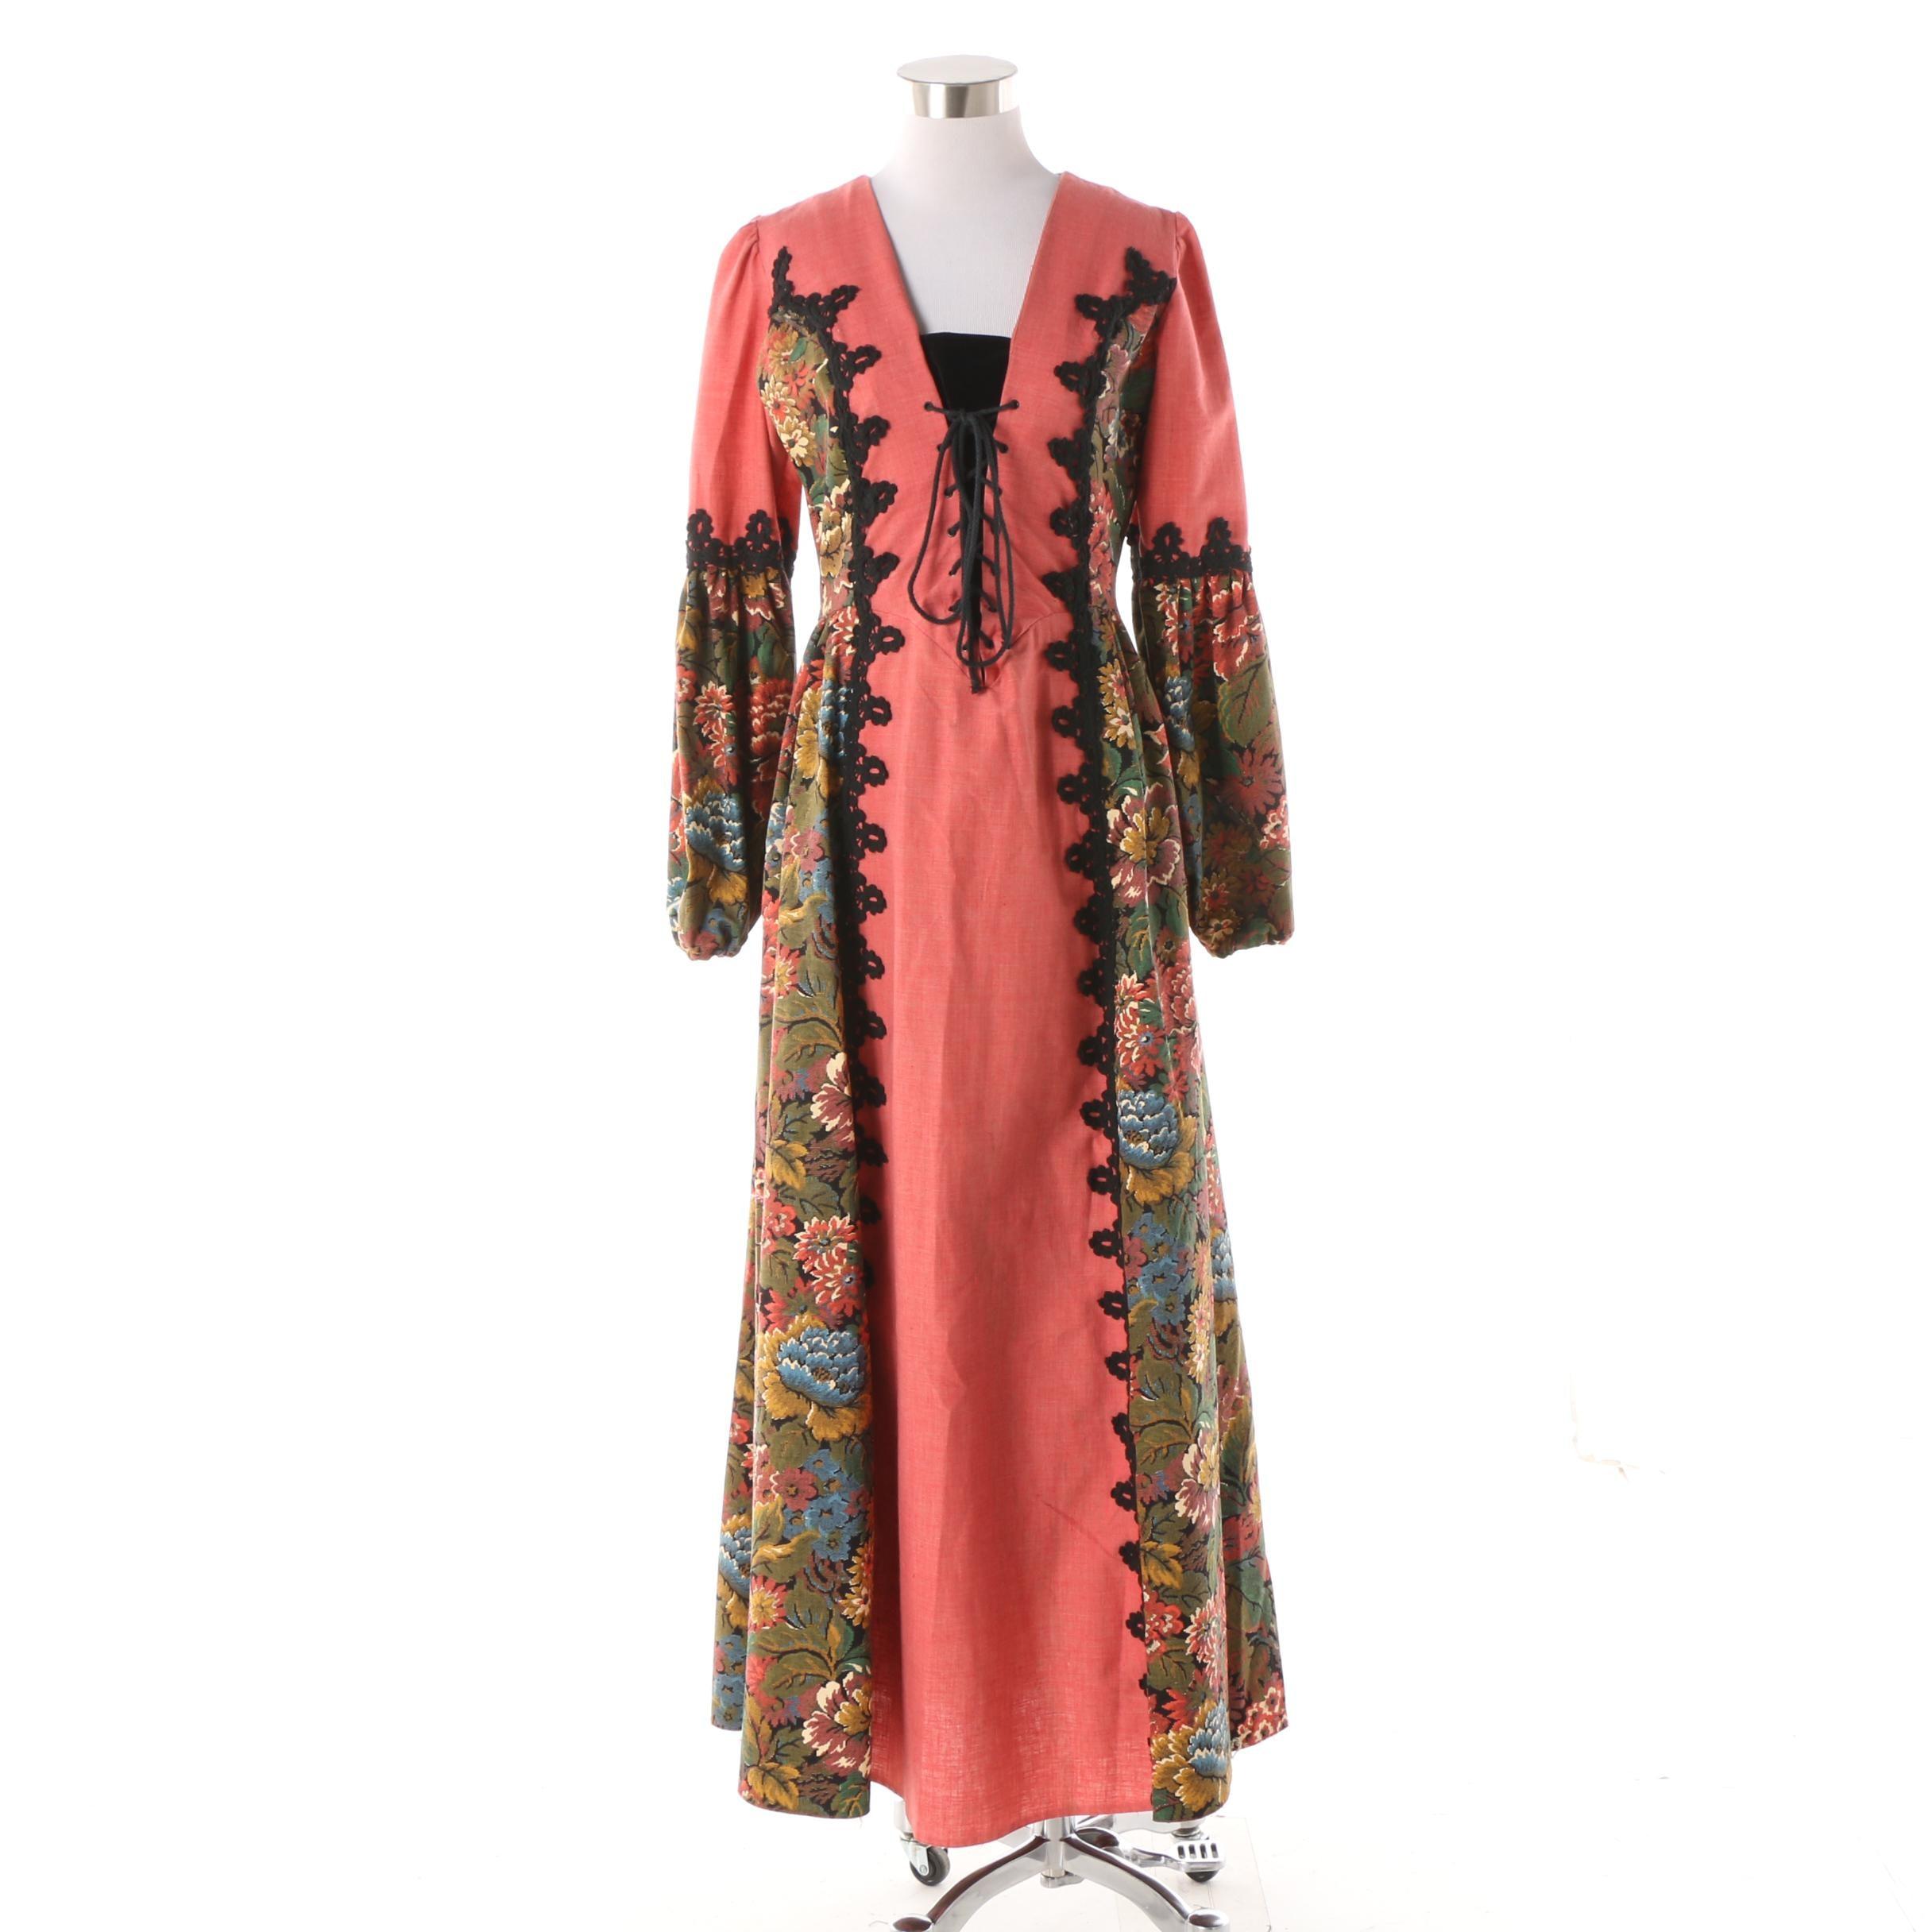 Circa 1960s Gunne Sax of California Renaissance Inspired Tapestry Dress